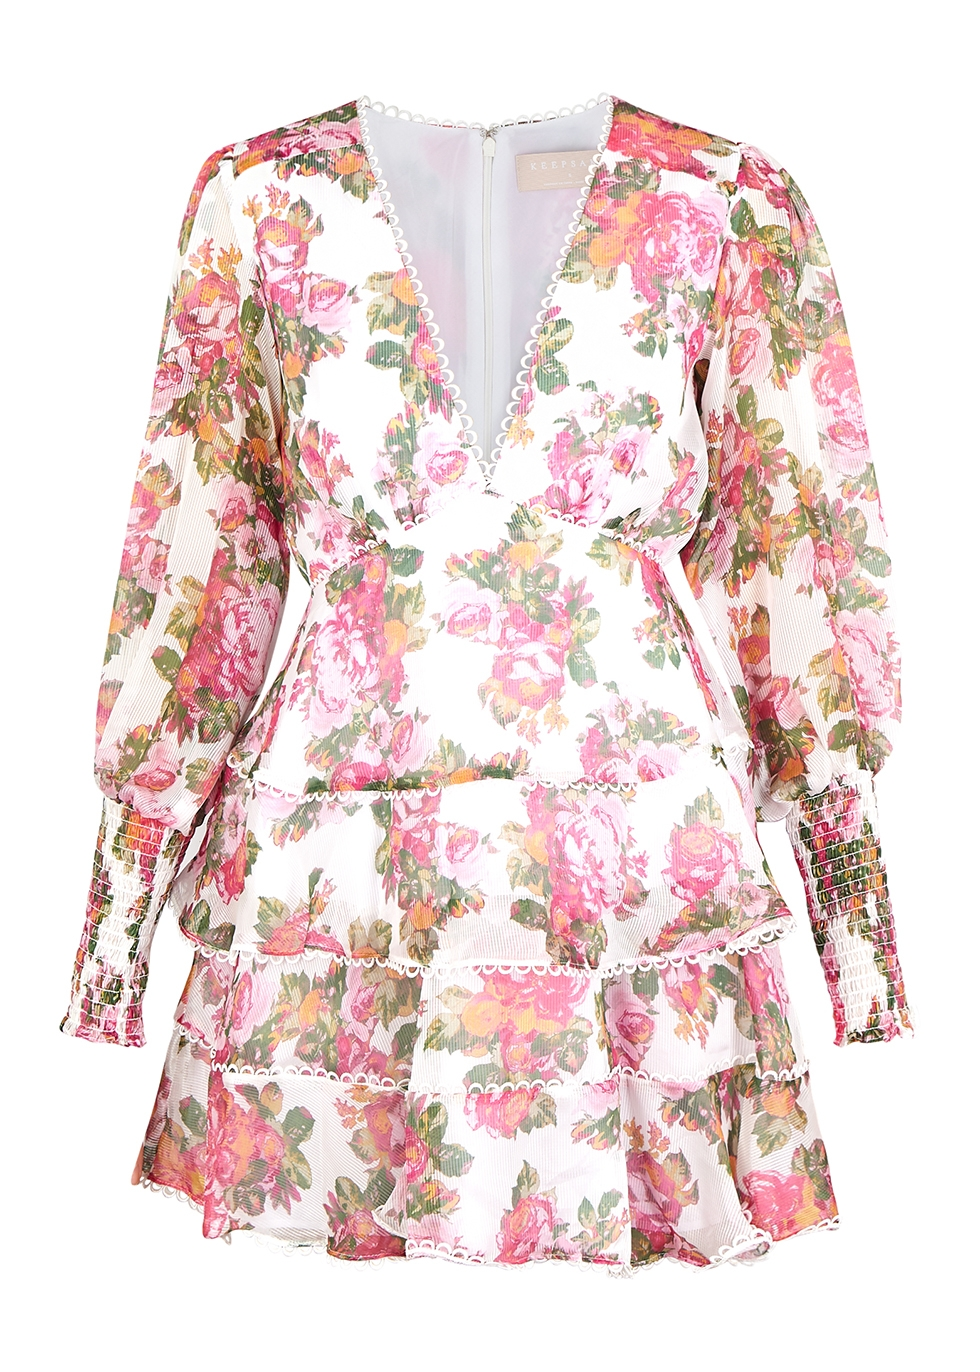 Oblivion floral georgette mini dress - KEEPSAKE